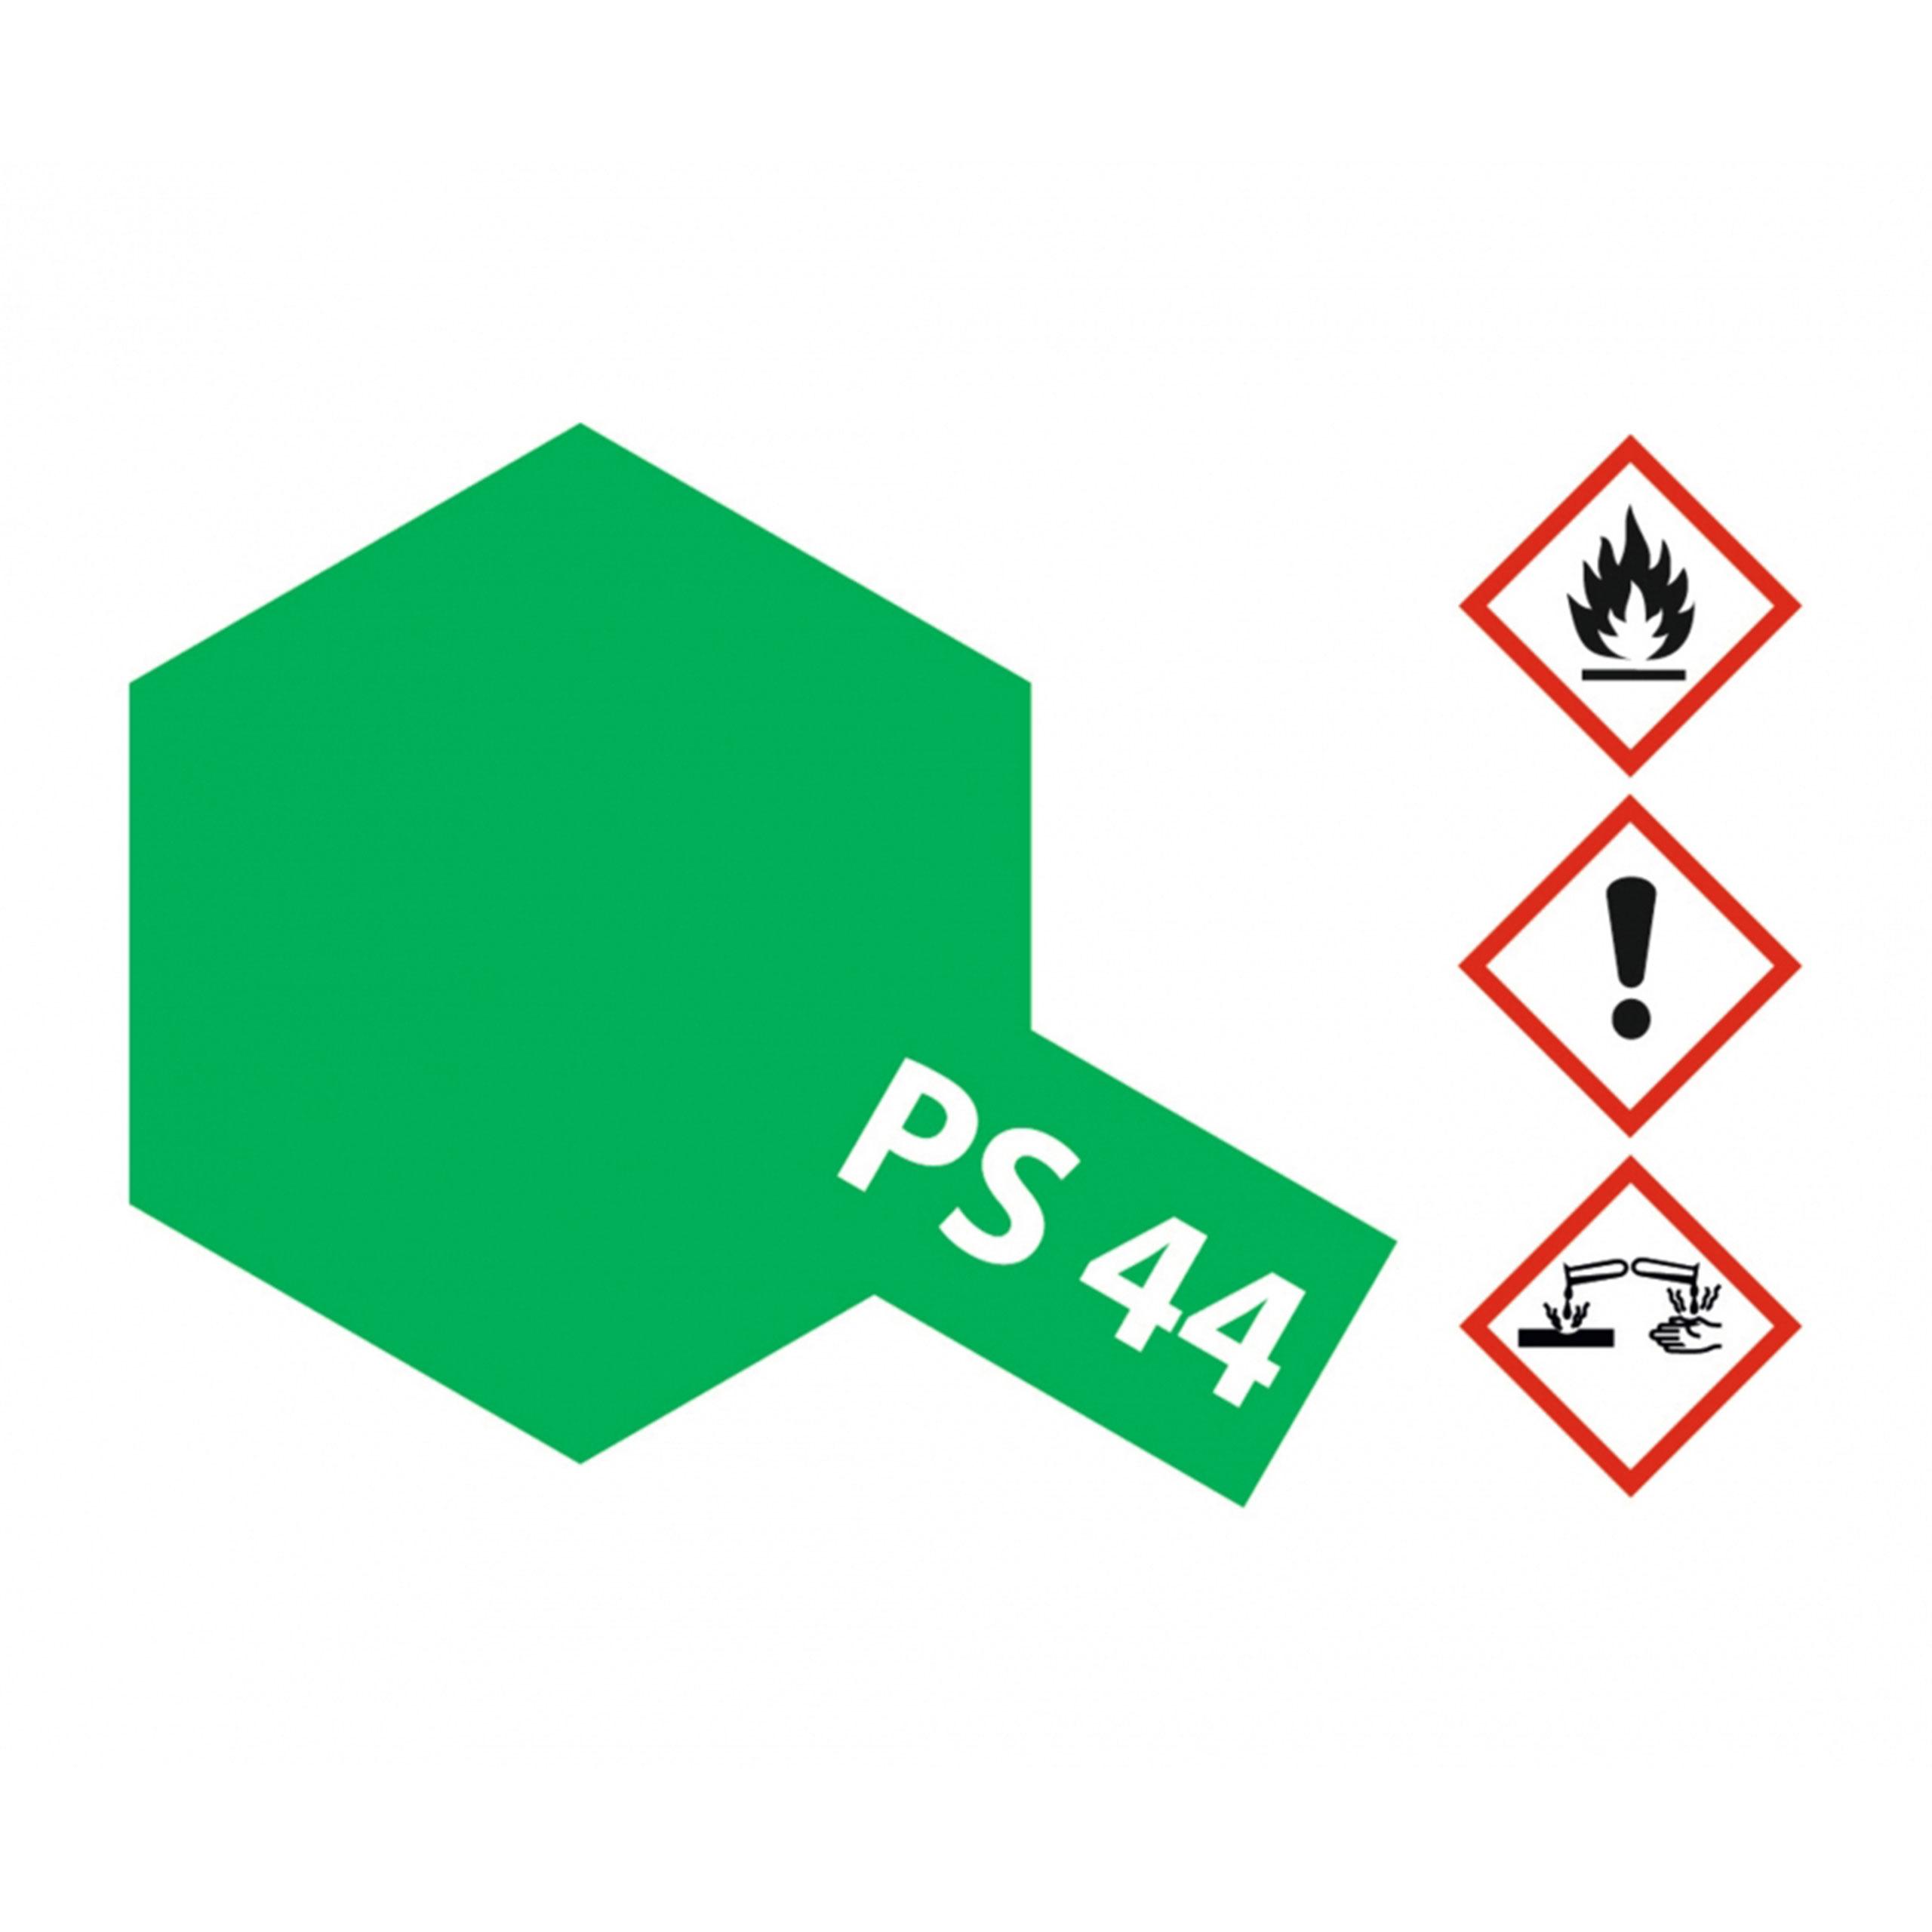 PS-44 Translucent Gruen Polyc. - 100ml Sprayfarbe Lexan - Tamiya 300086044